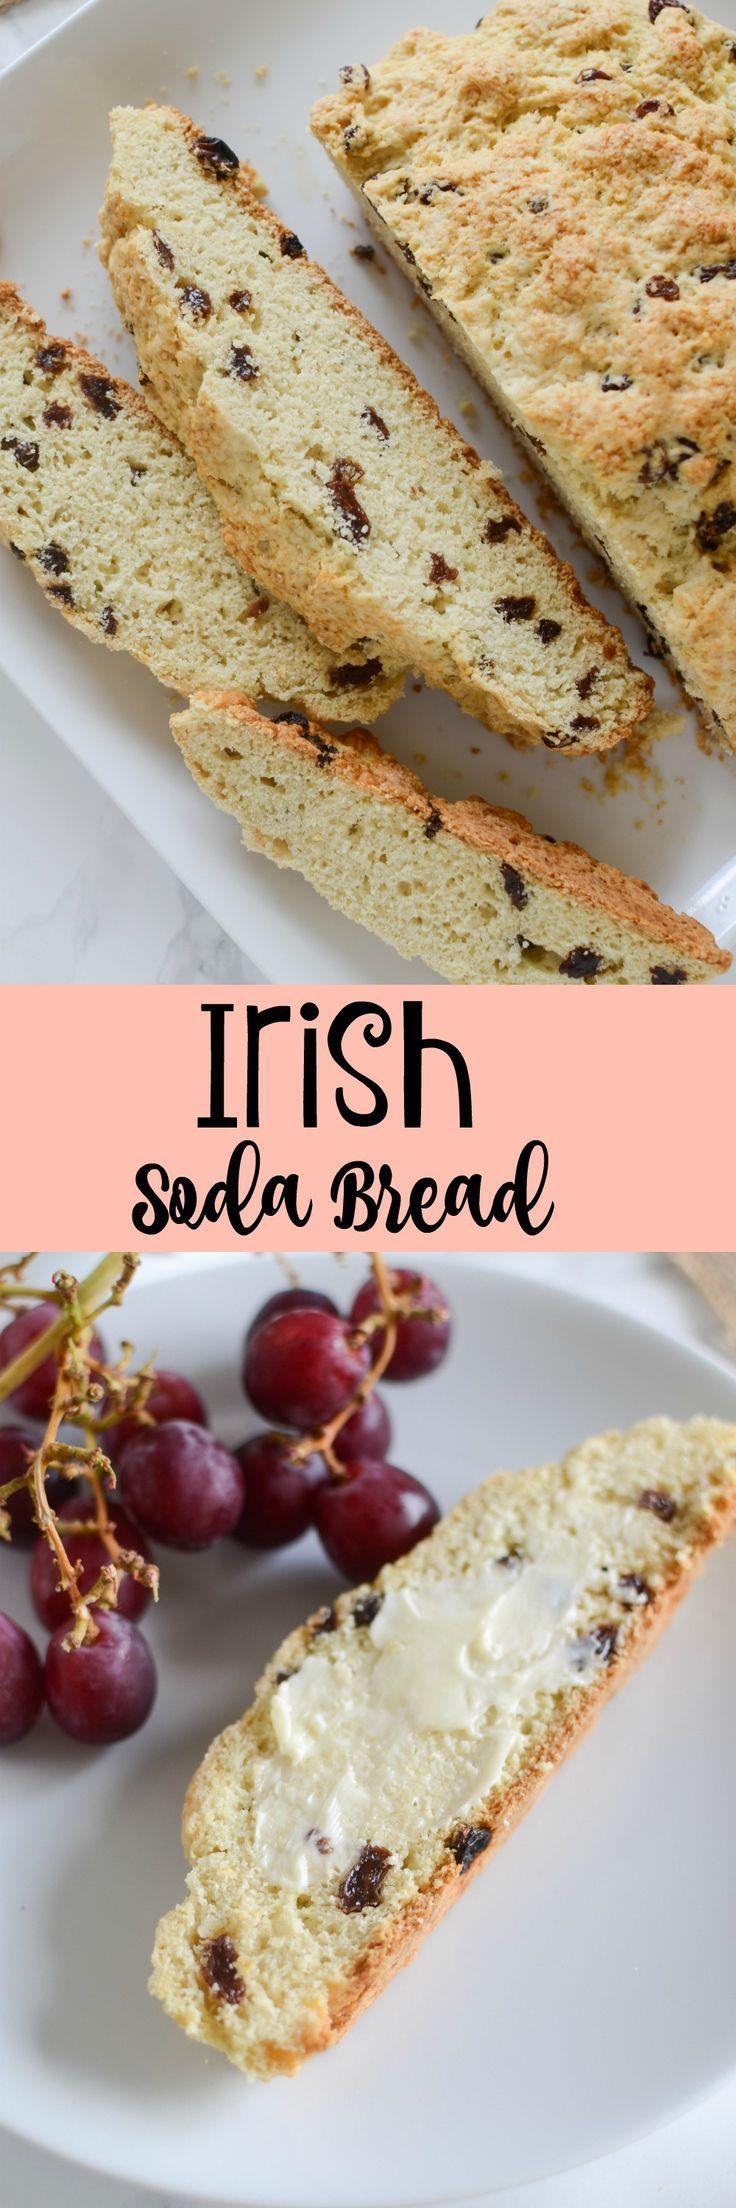 Classic Irish Soda Bread recipe - easy quick bread studded with raisins. This bread will become a St. Patrick's Day tradition!